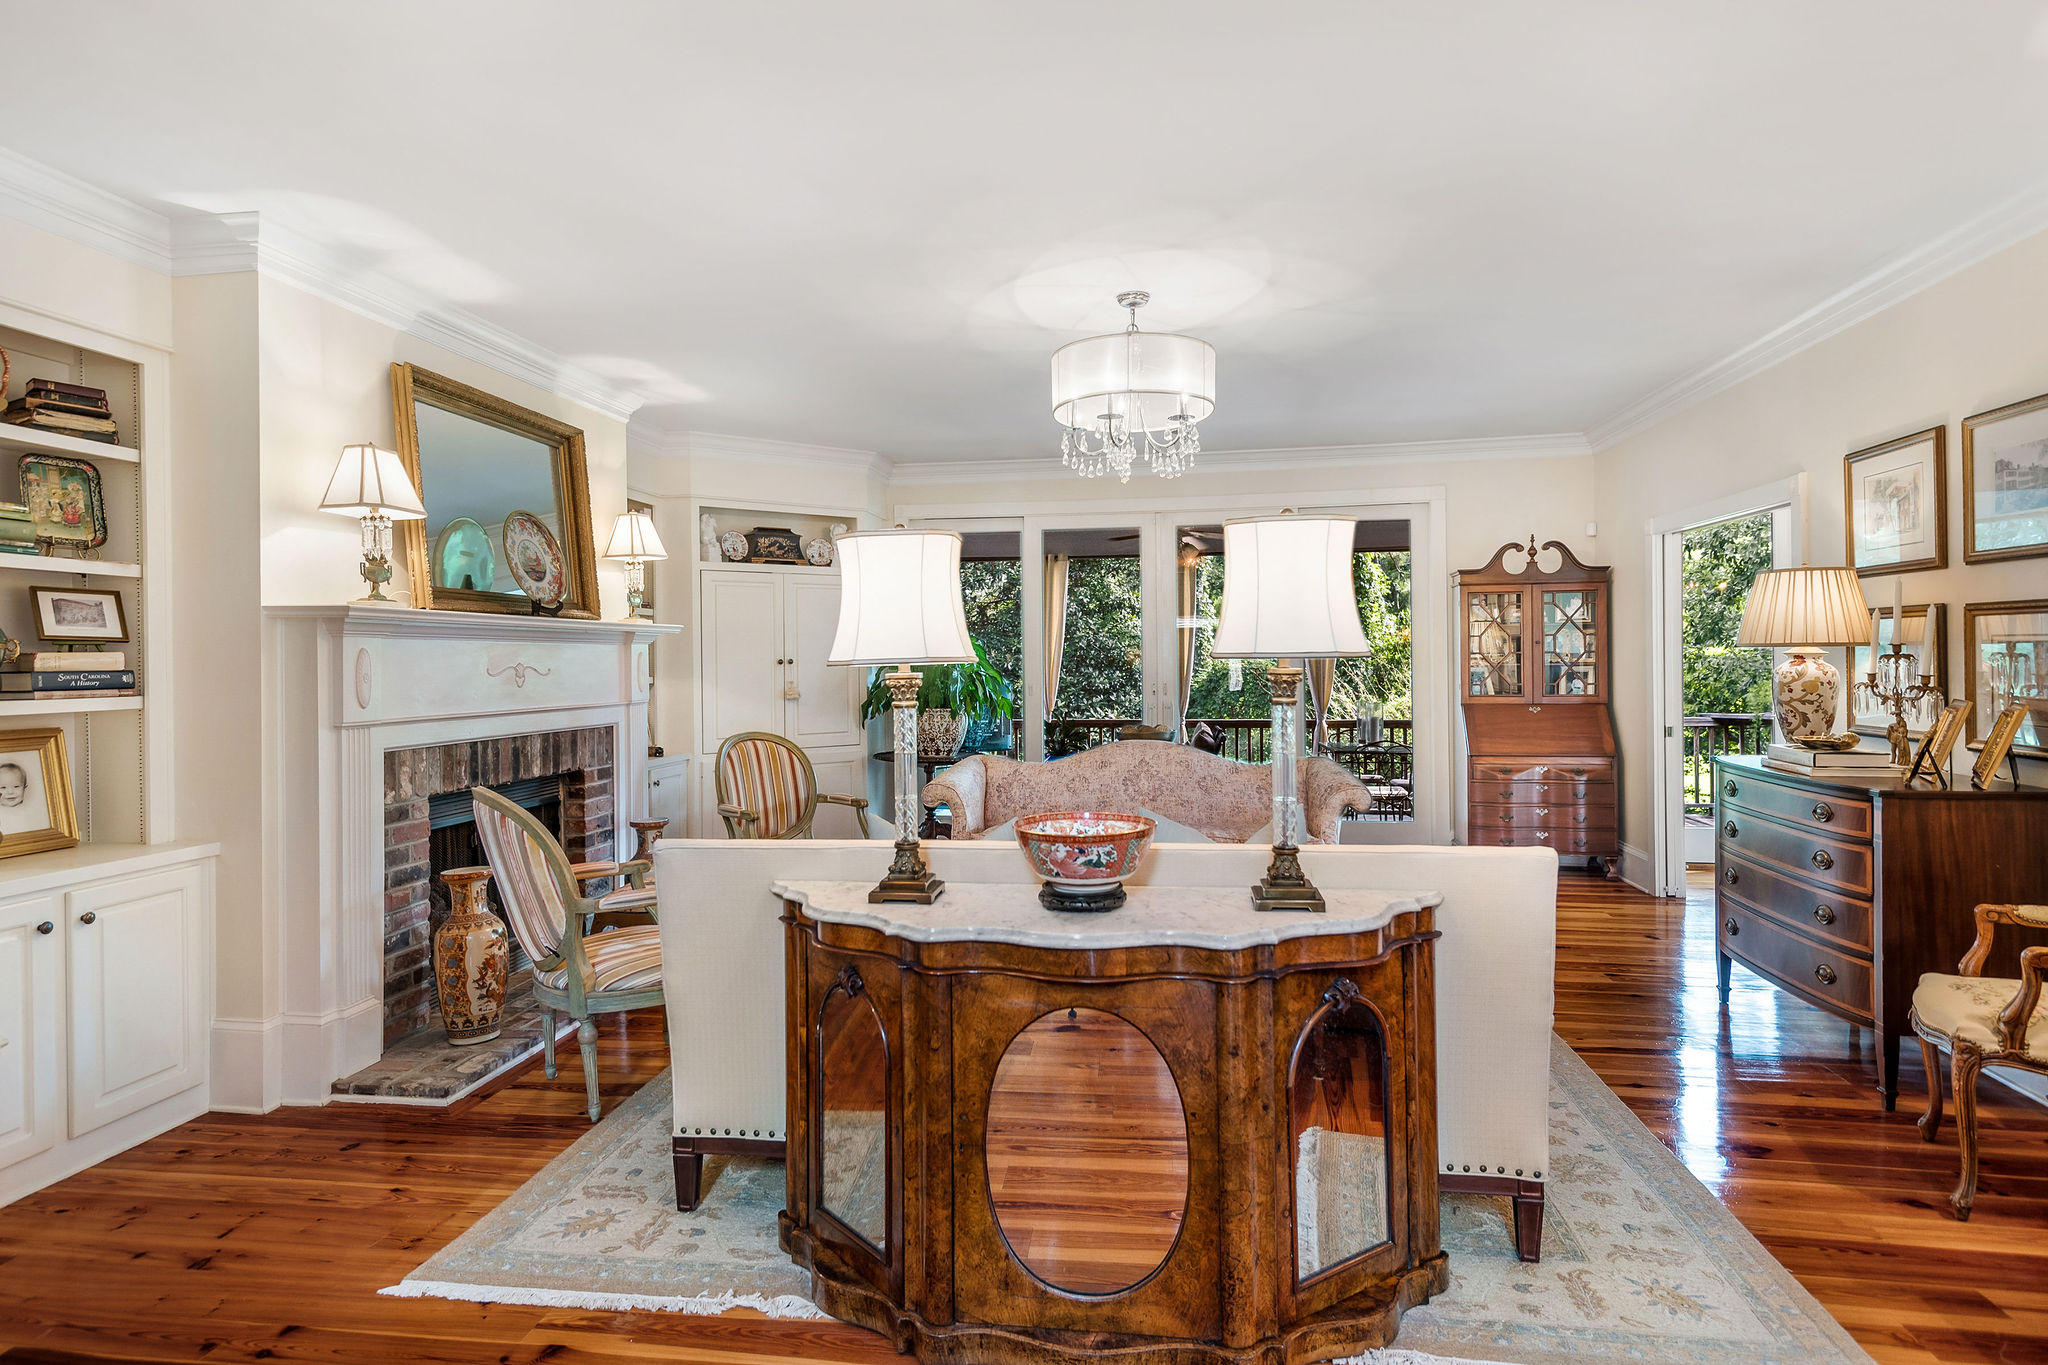 Country Club II Homes For Sale - 1482 Burningtree, Charleston, SC - 53